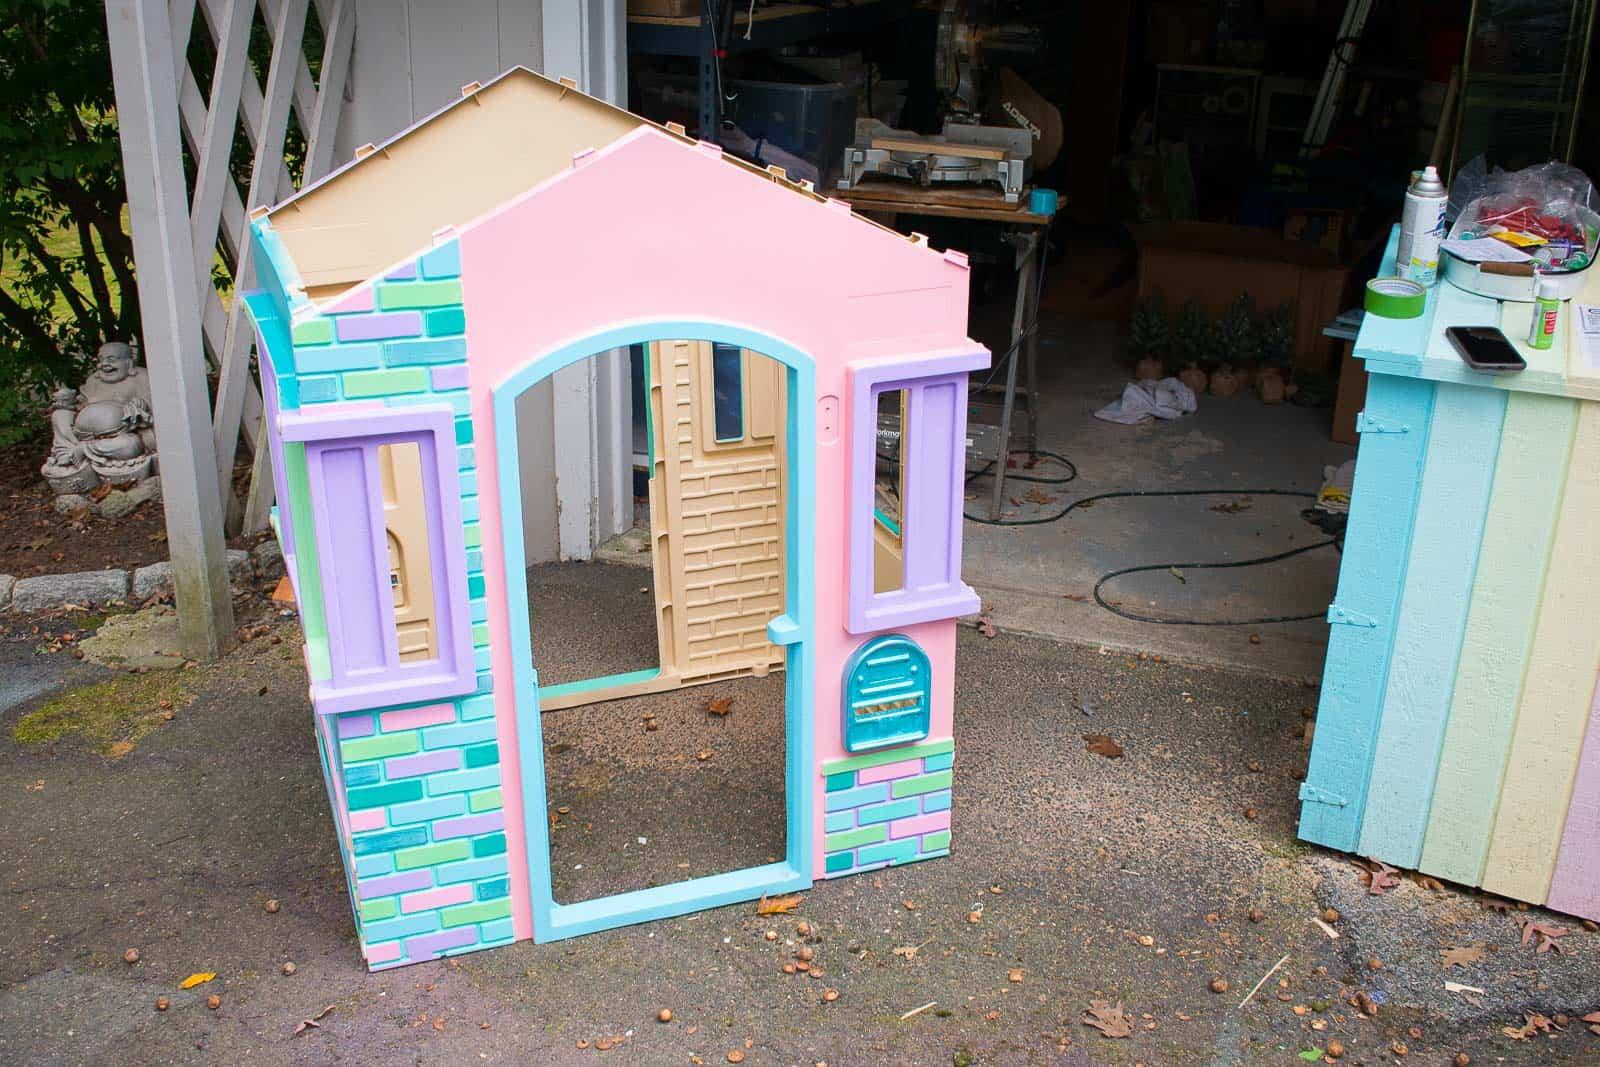 assemble the plastic house